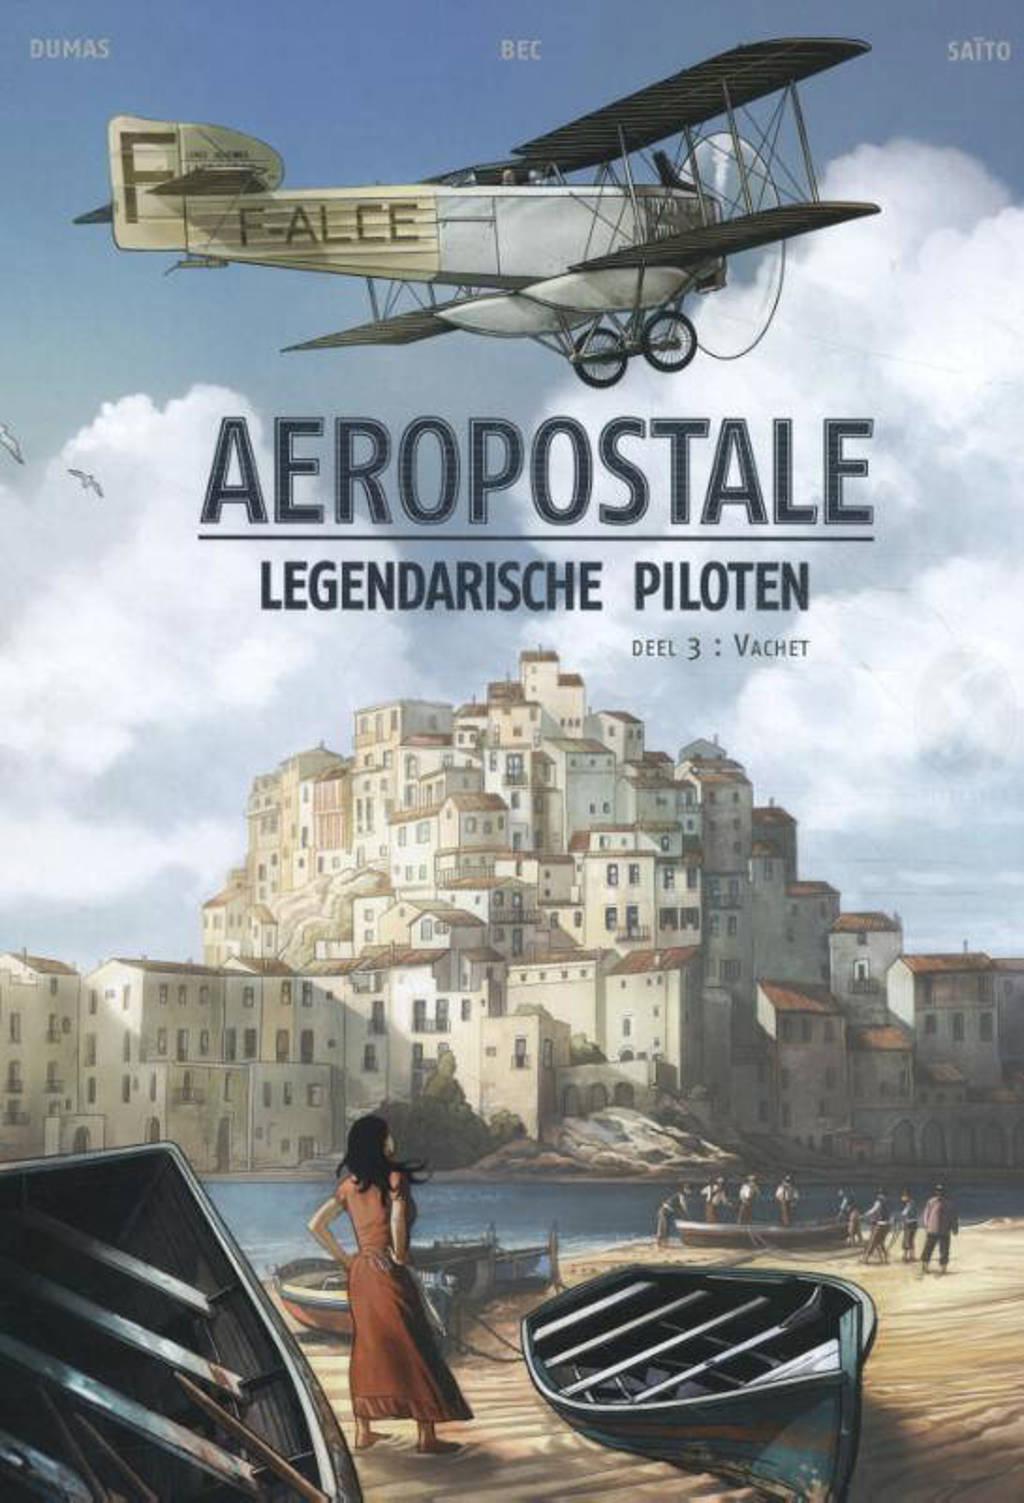 Aeropostale: Legendarische piloten Vachet - Christophe Bec, Diogo Saïto en Patrick A Dumas